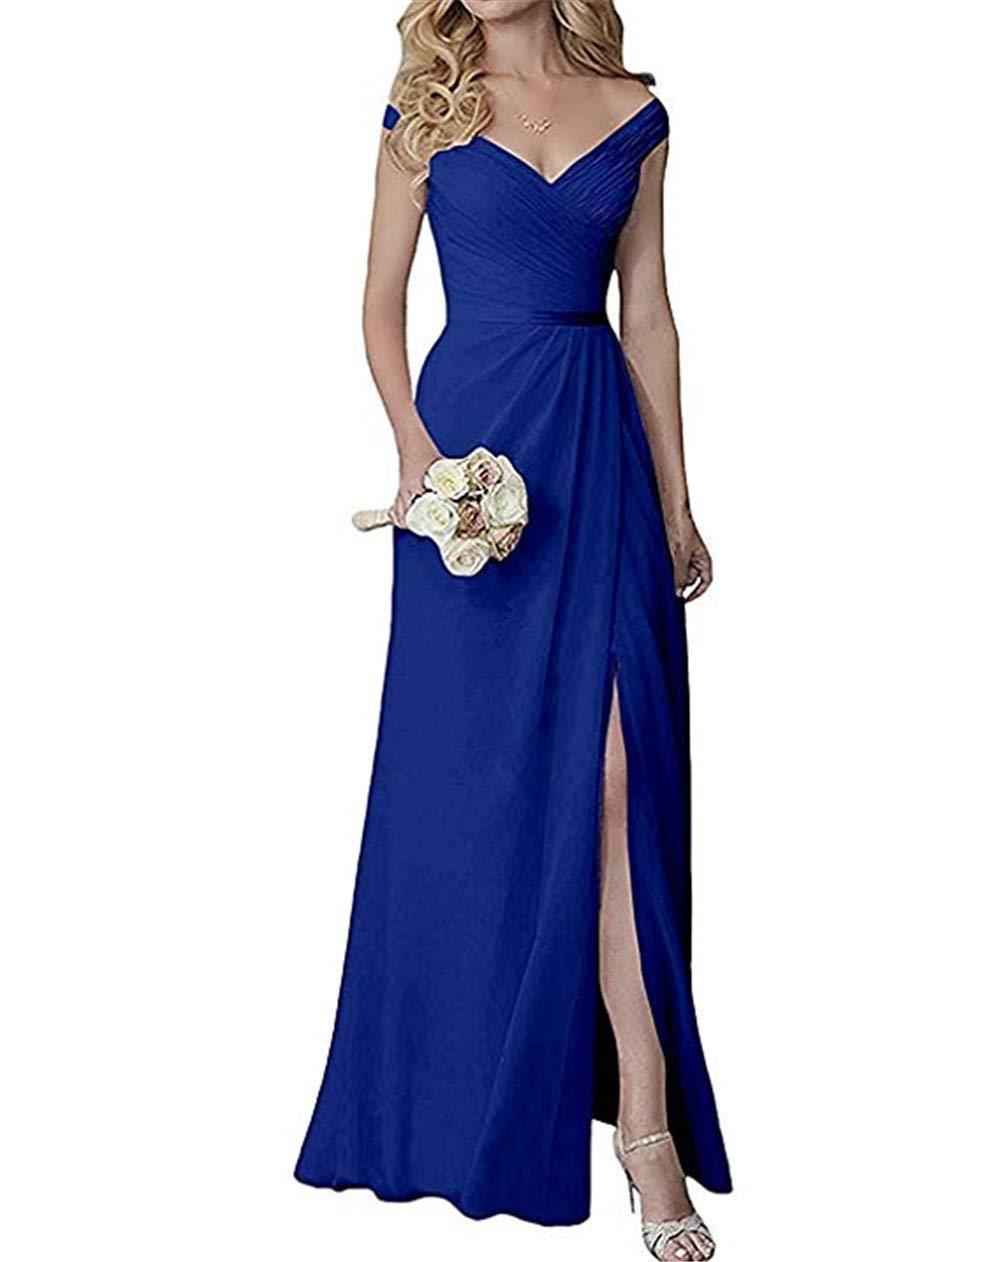 Off The Shoulder Bridesmaid Dresses Long V Neck Split Chiffon Prom Evening Gowns